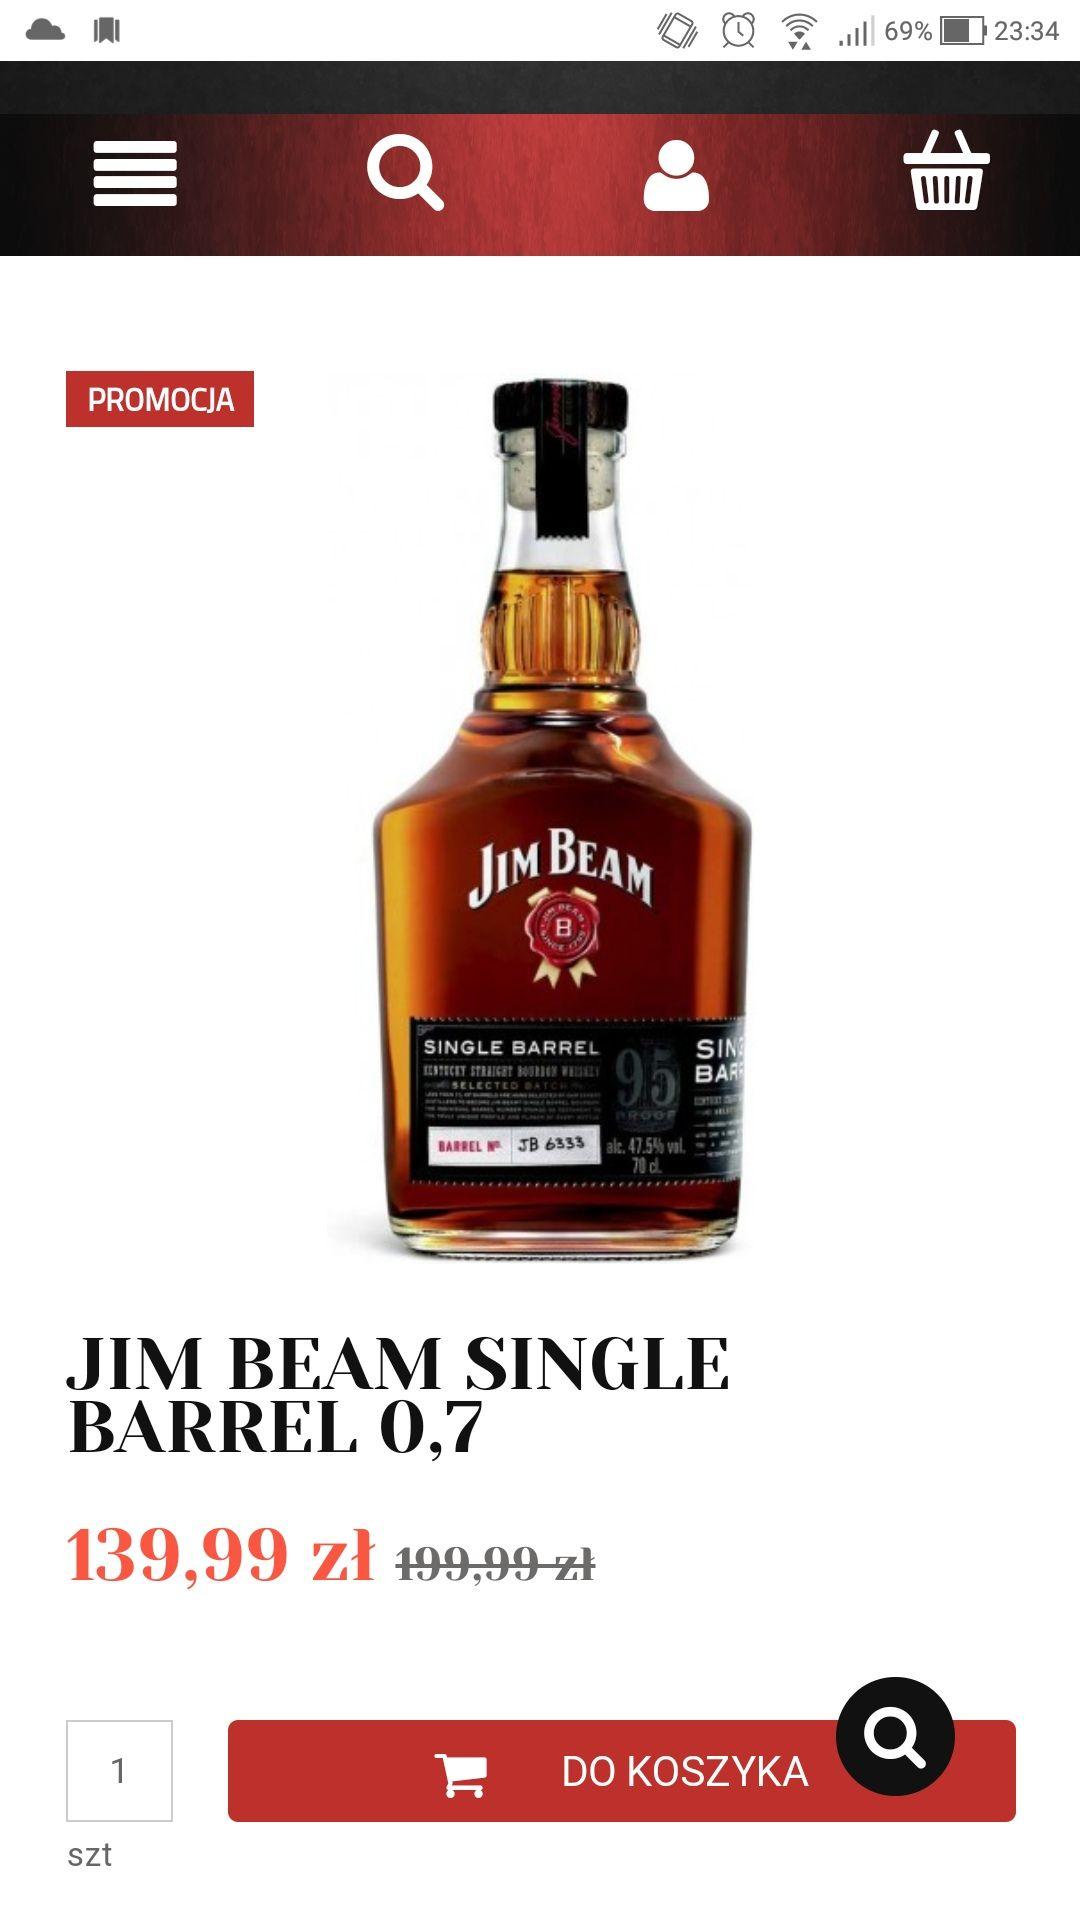 JIM BEAM SINGLE BARREL 0,7